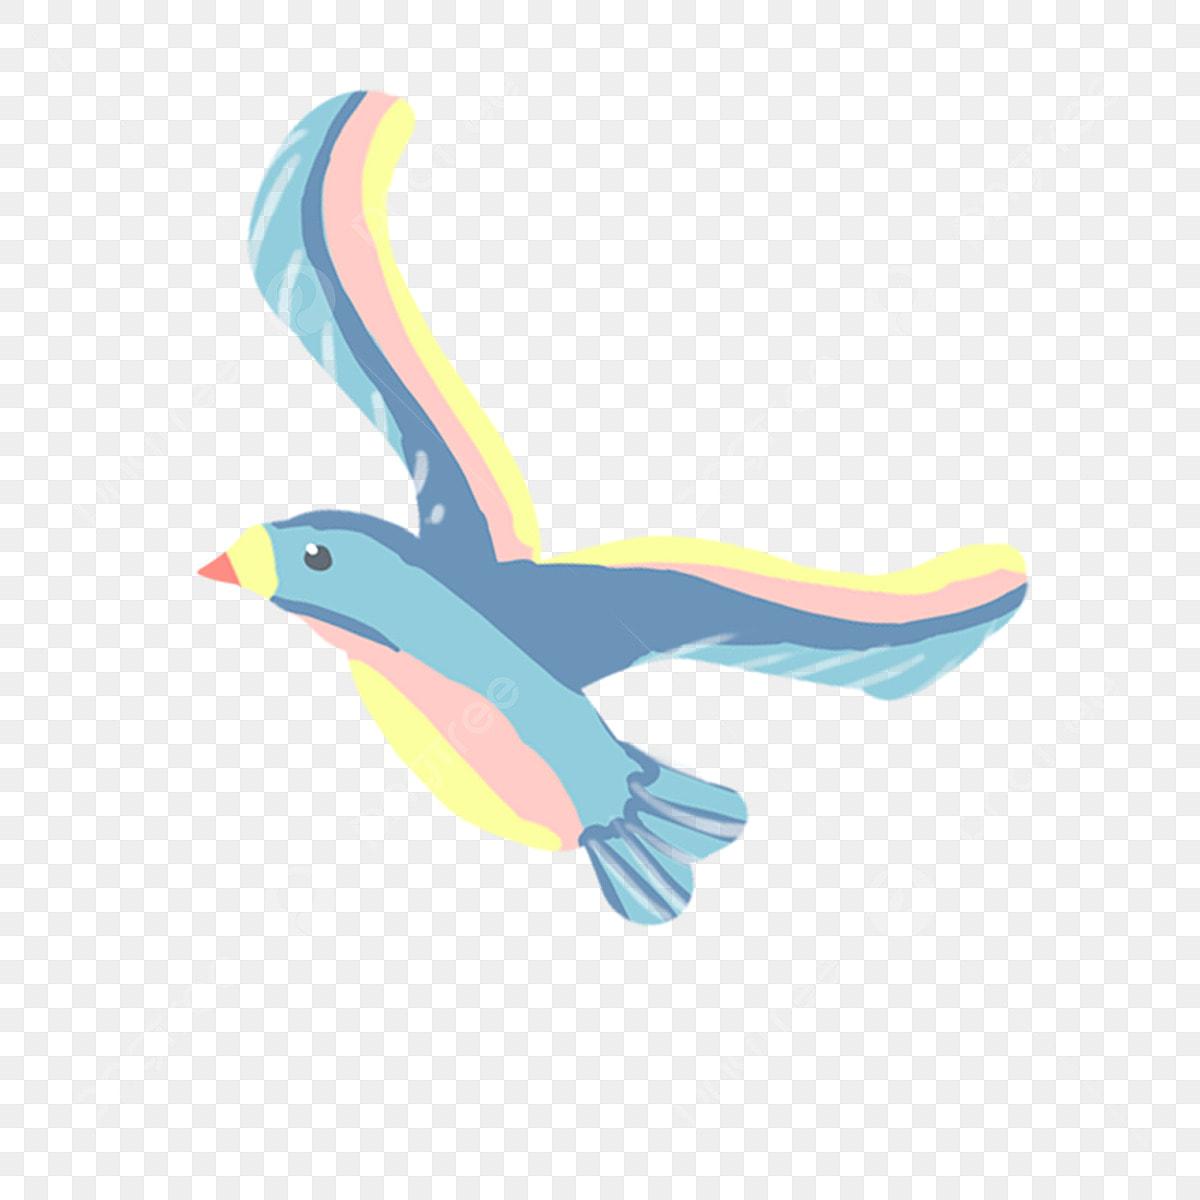 Kartun Binatang Burung Burung Camar Burung Muat Turun